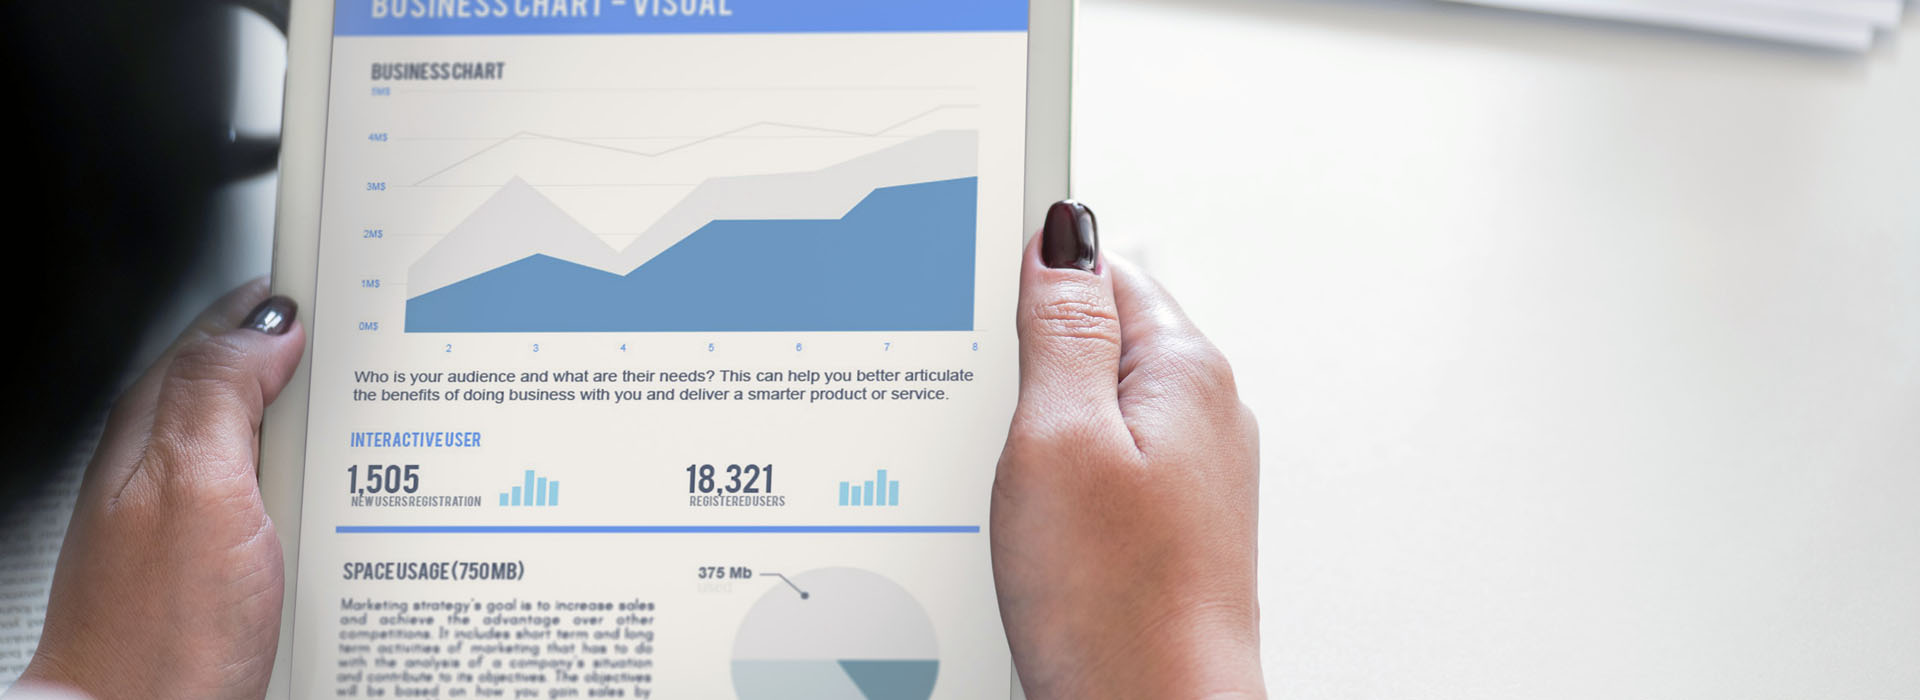 Finding Market Information